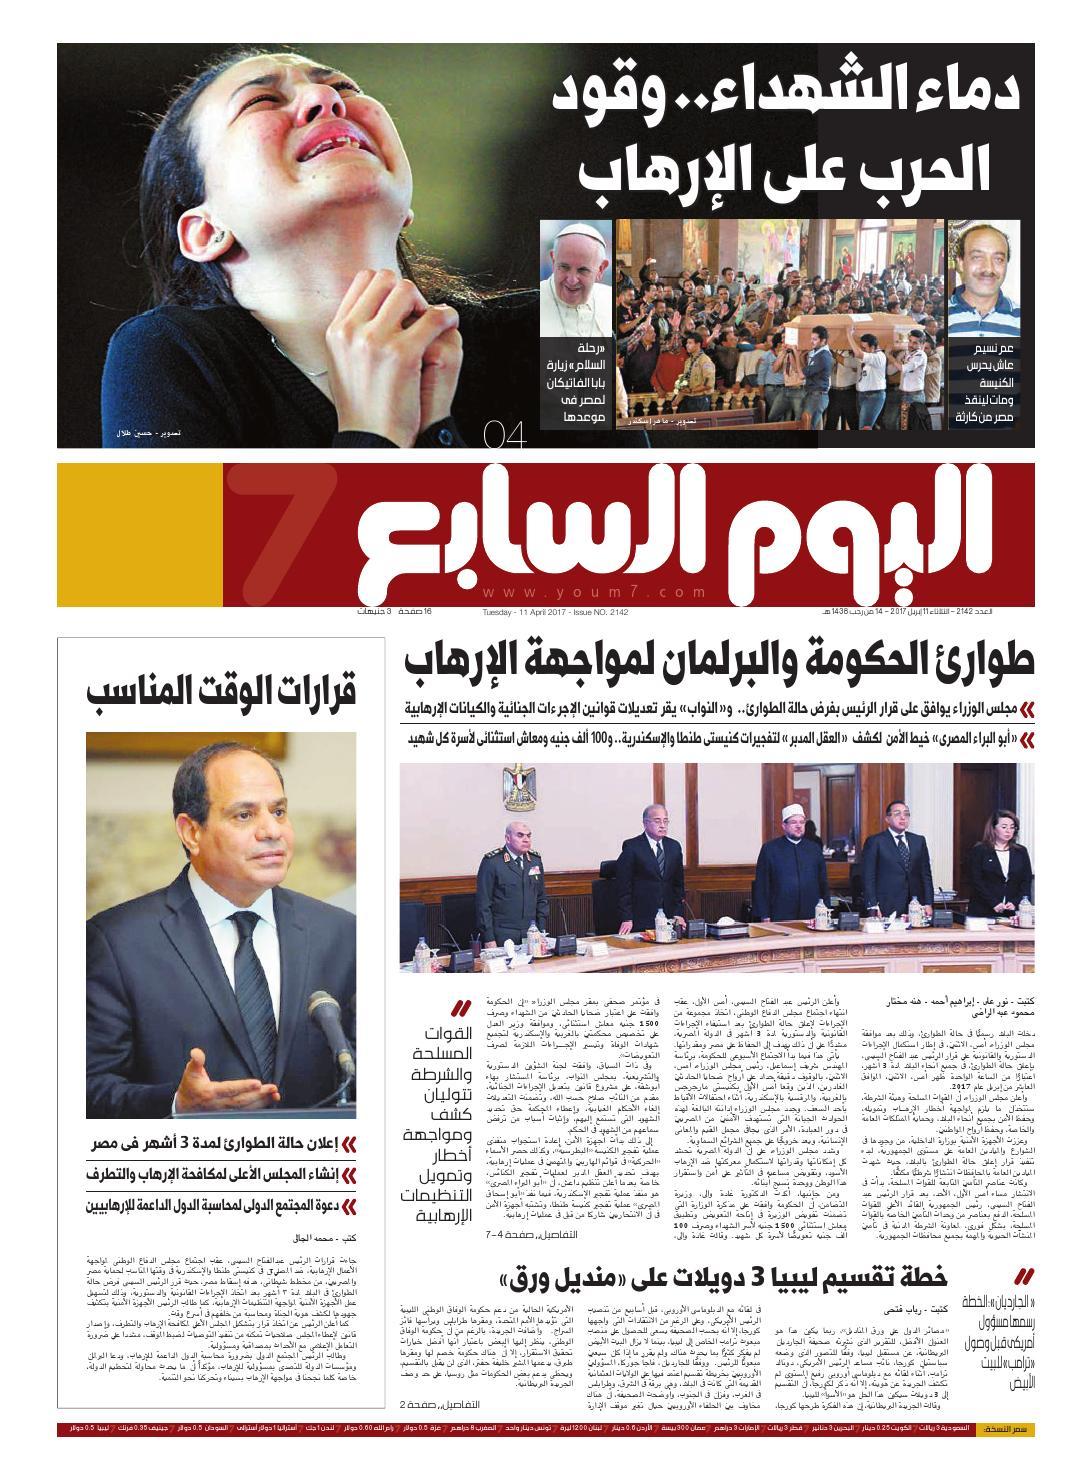 2c5ed7ec28d12 11 04 2017 youm7 by اليوم السابع - issuu